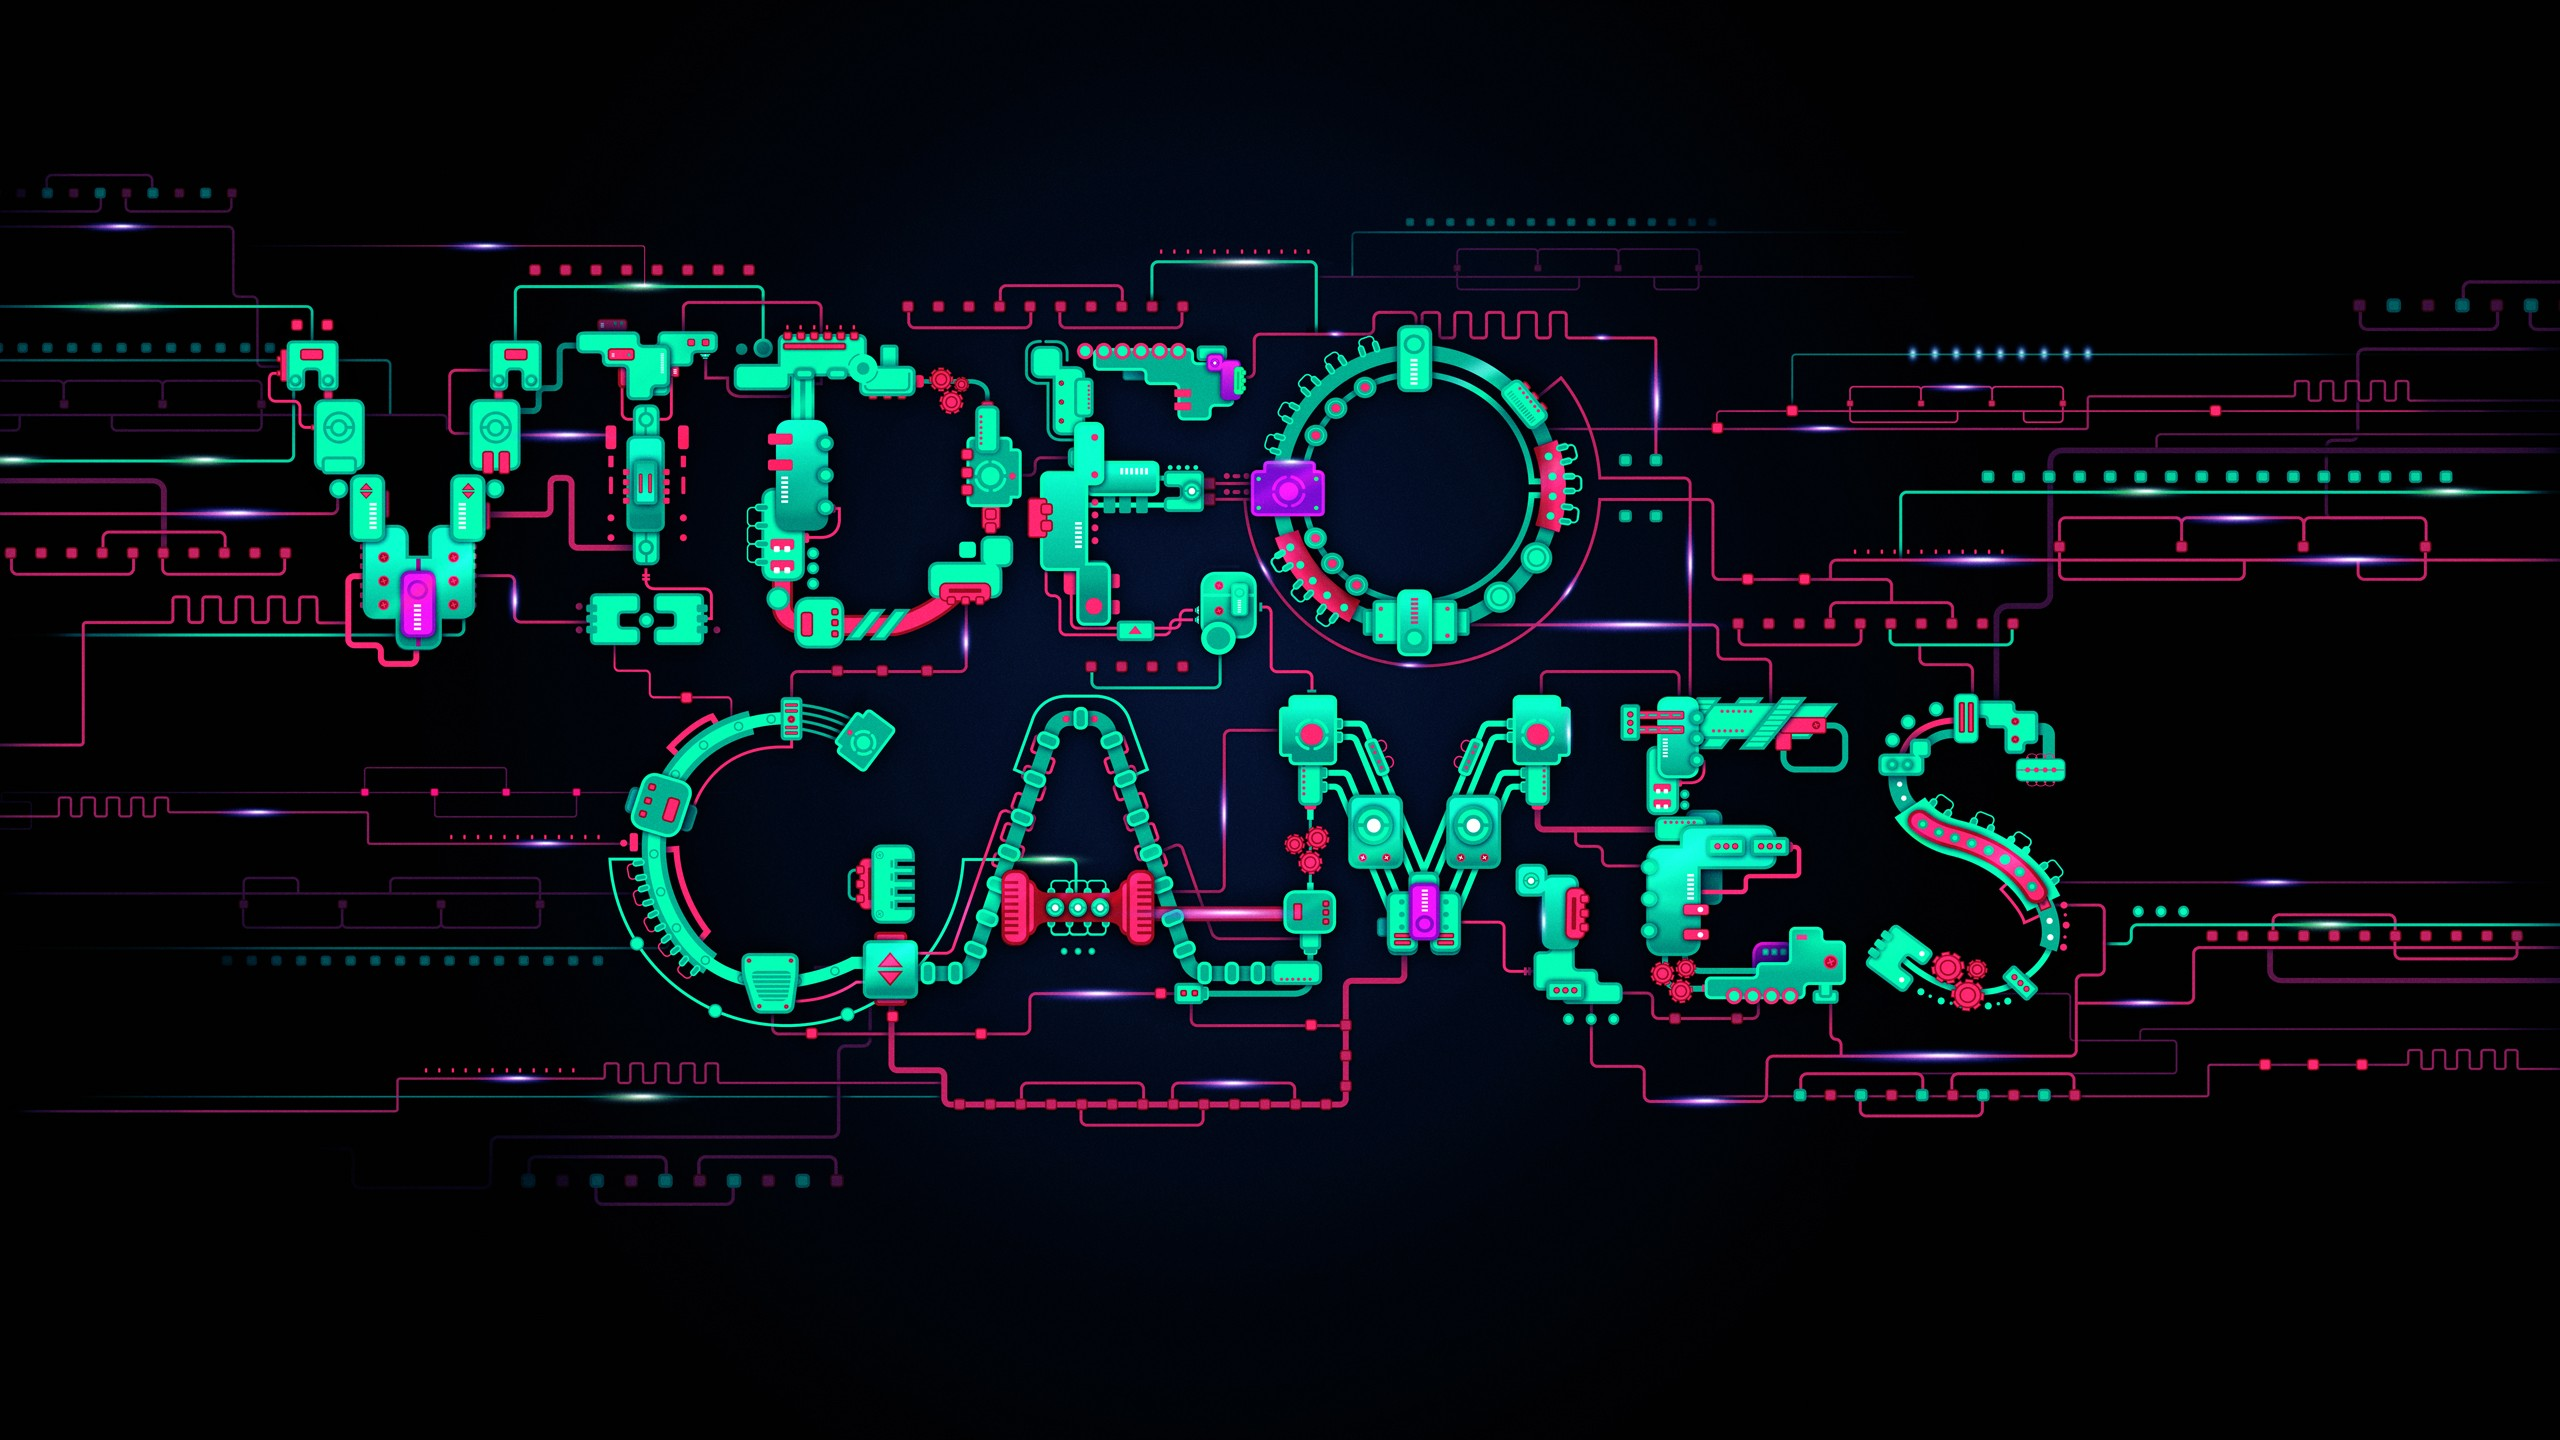 net81video games typography wallpapers 34421 2560x1440jpg 2560x1440